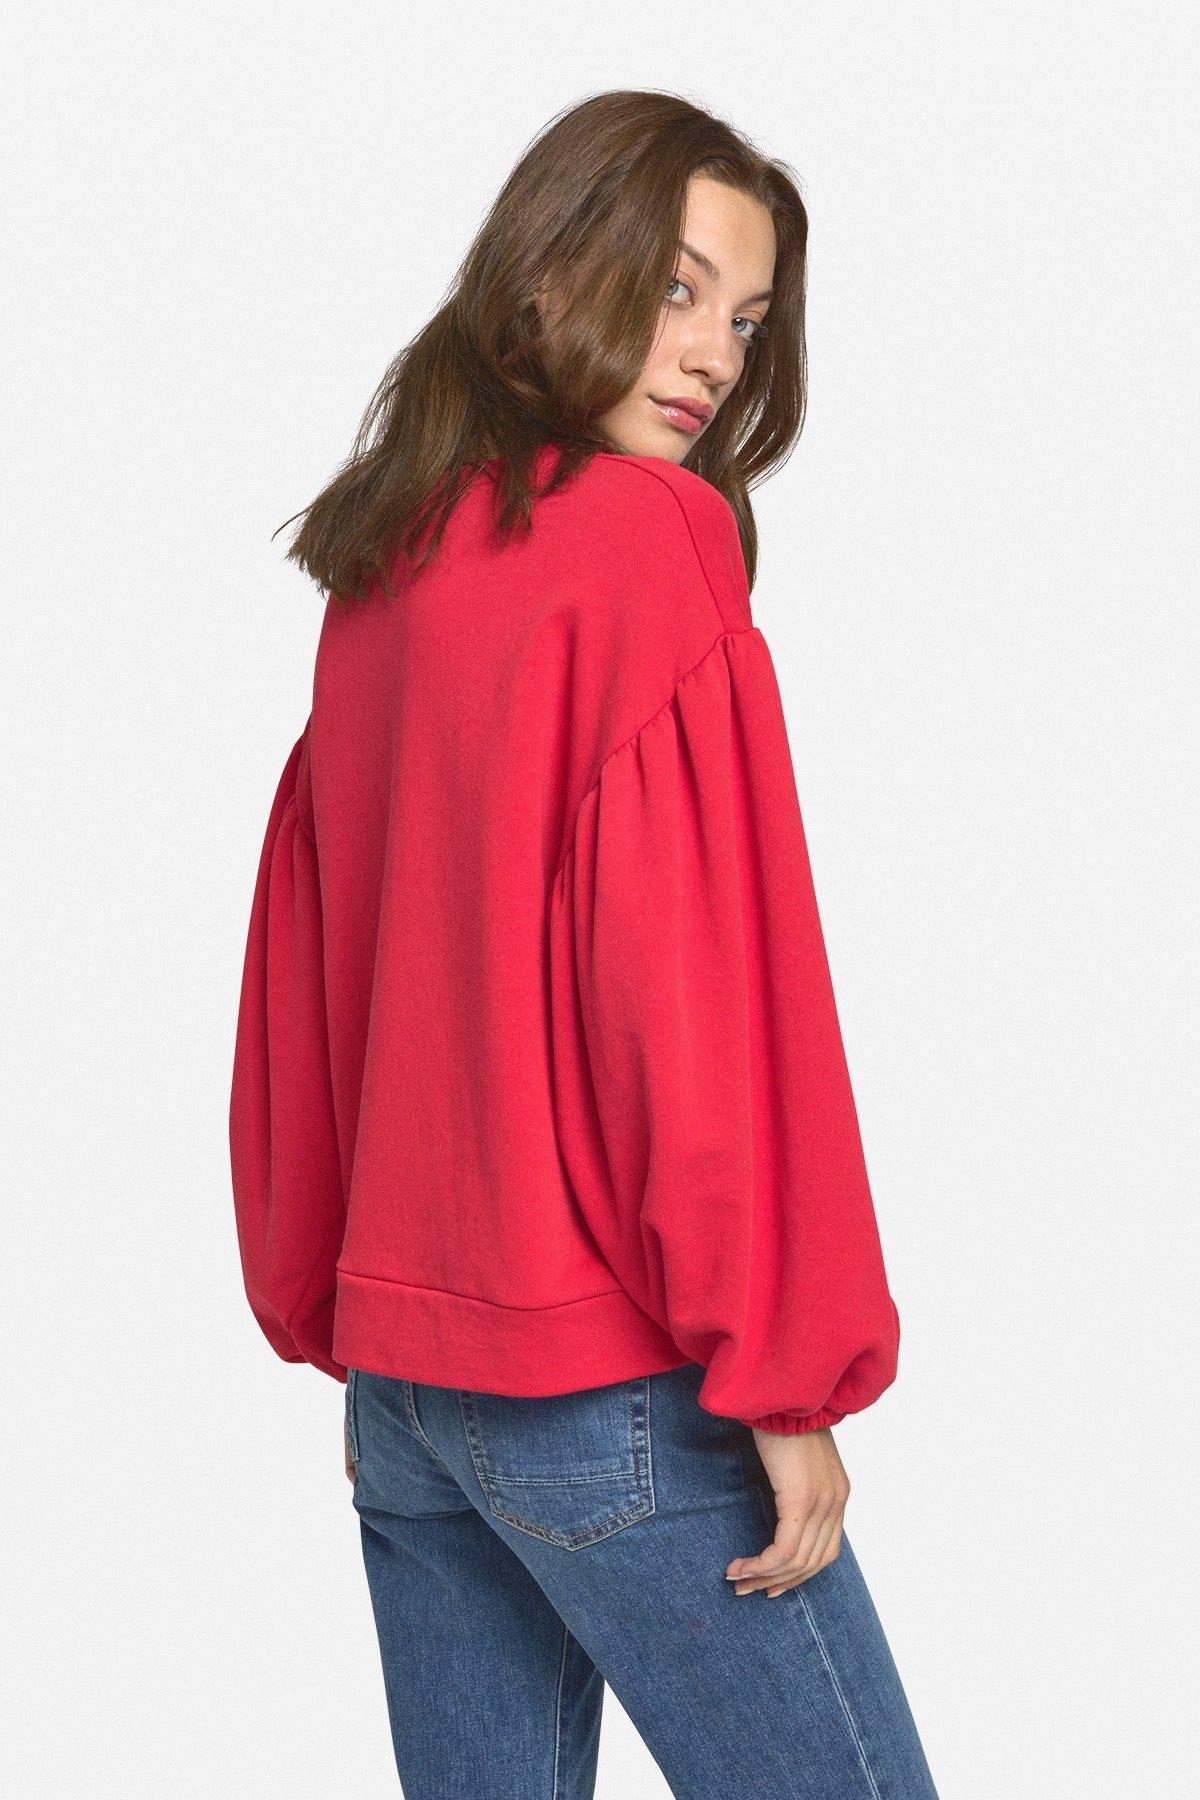 Sweatshirt with balloon sleeves